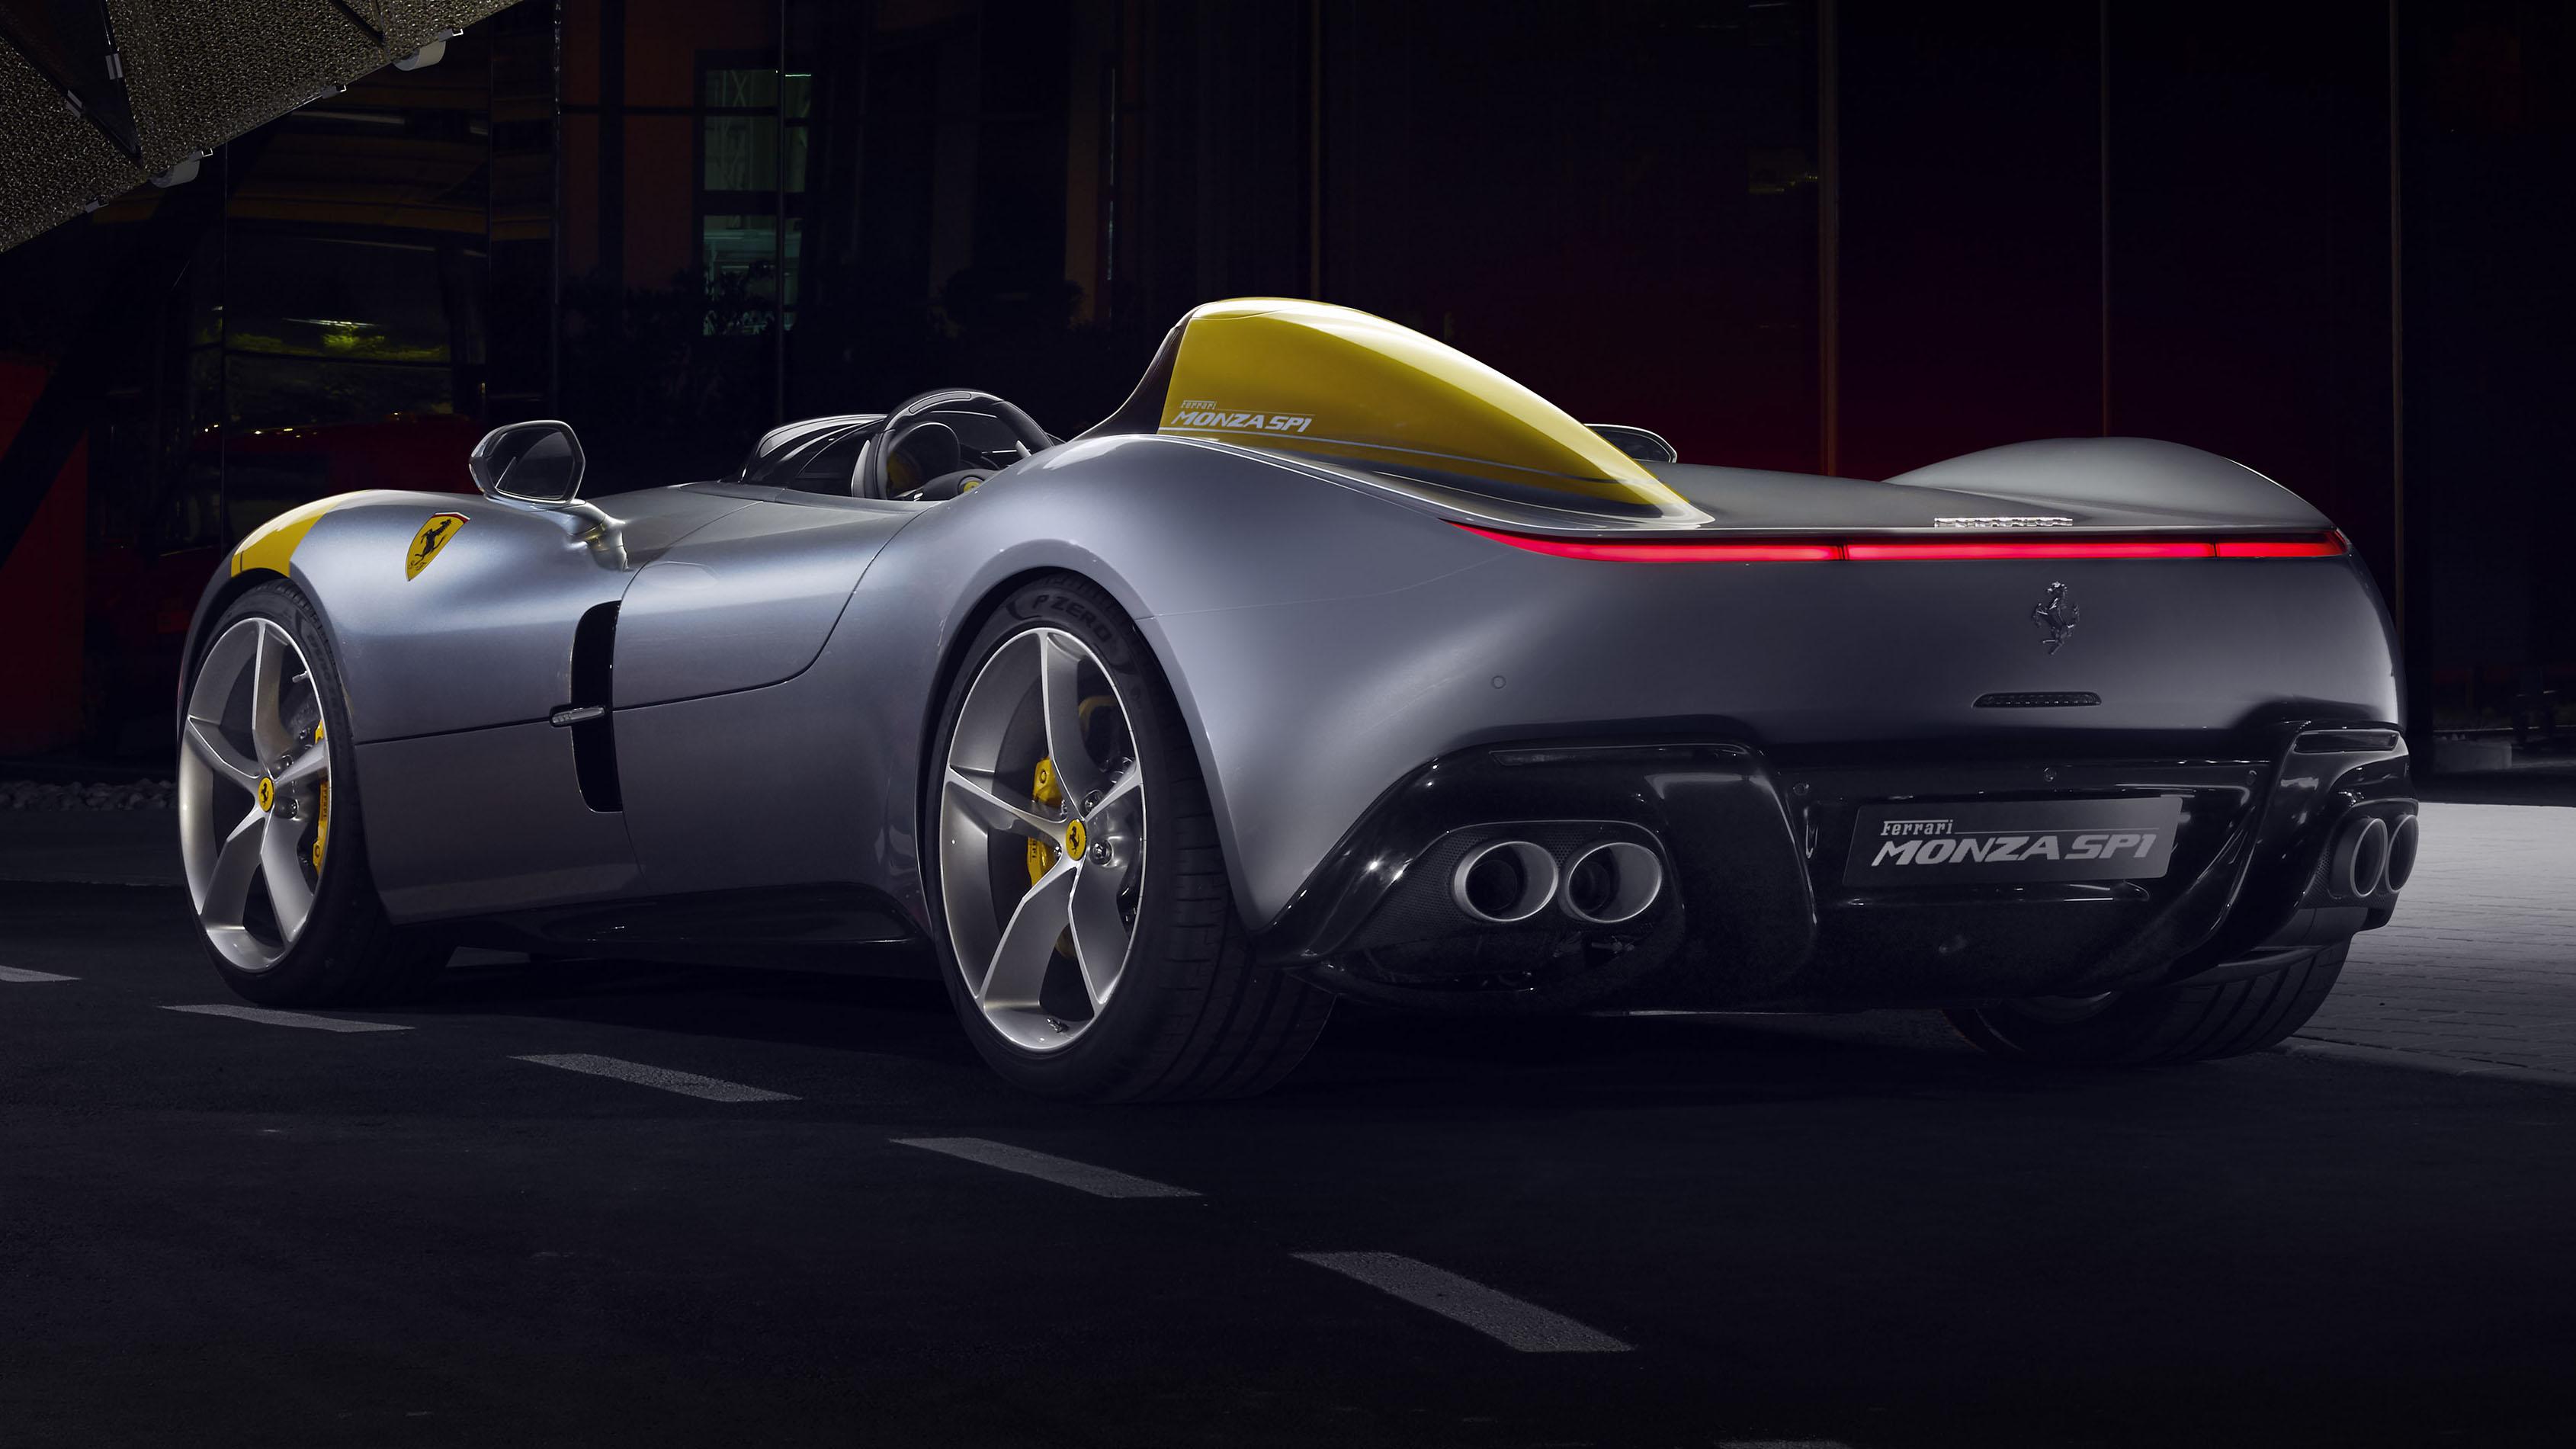 Ferrari Monza Sp1 And Sp2 Unveiled Caradvice